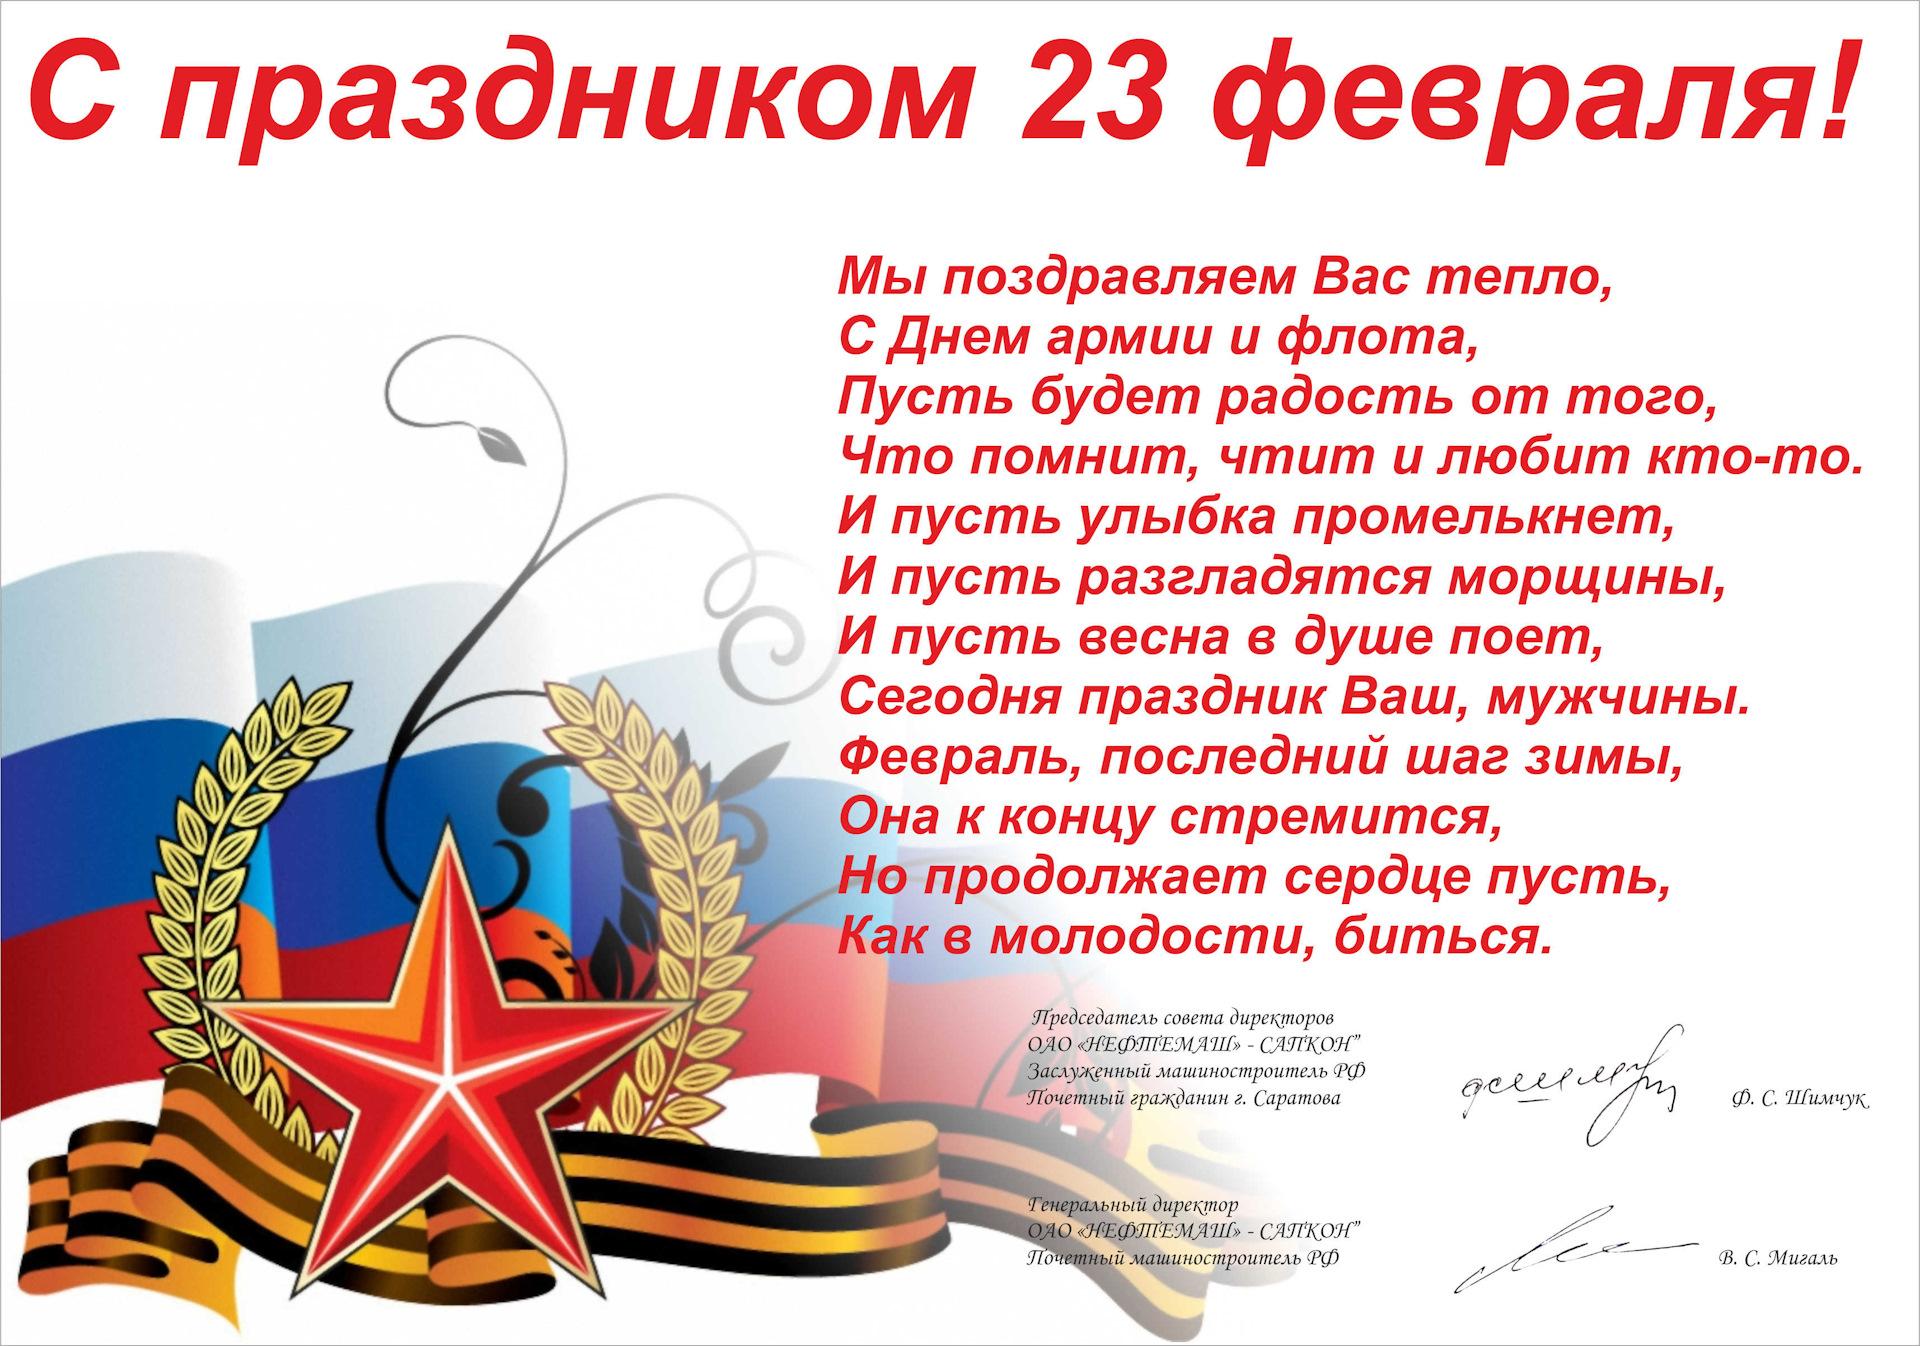 Поздравление коллектива мужчин с 23 февраля